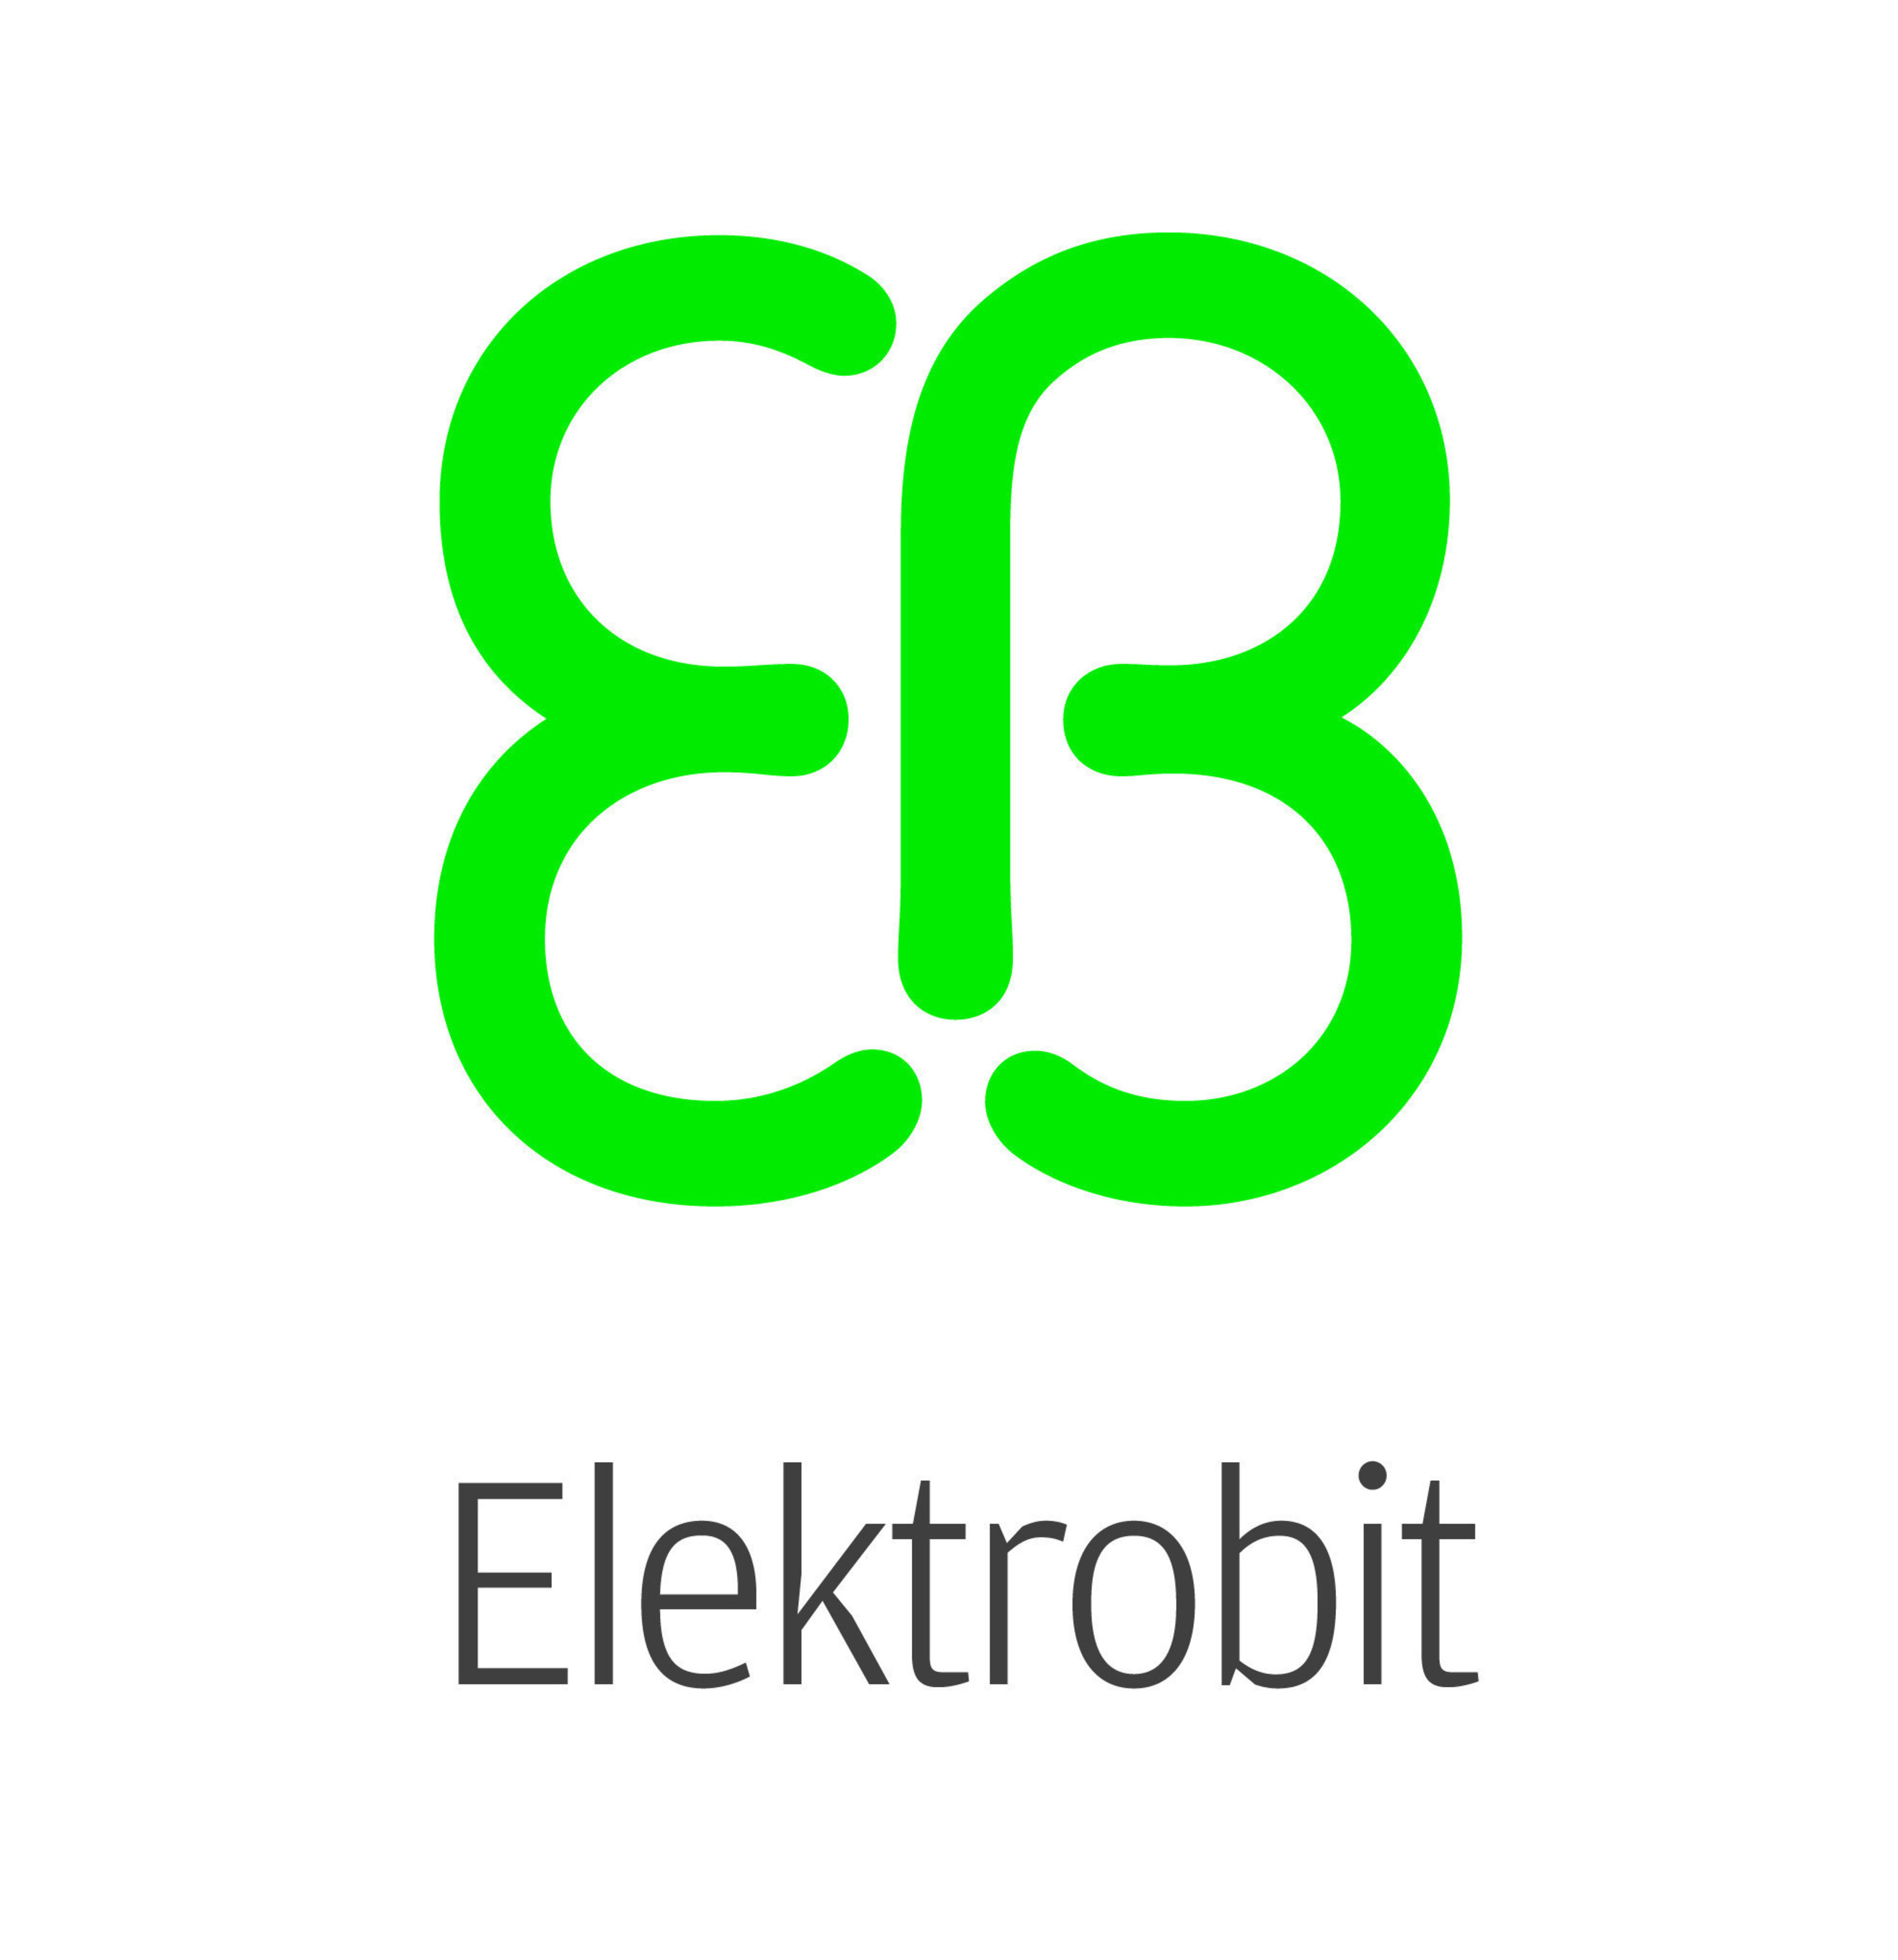 Elektrobit partners with Udacity, gaining access to graduates of